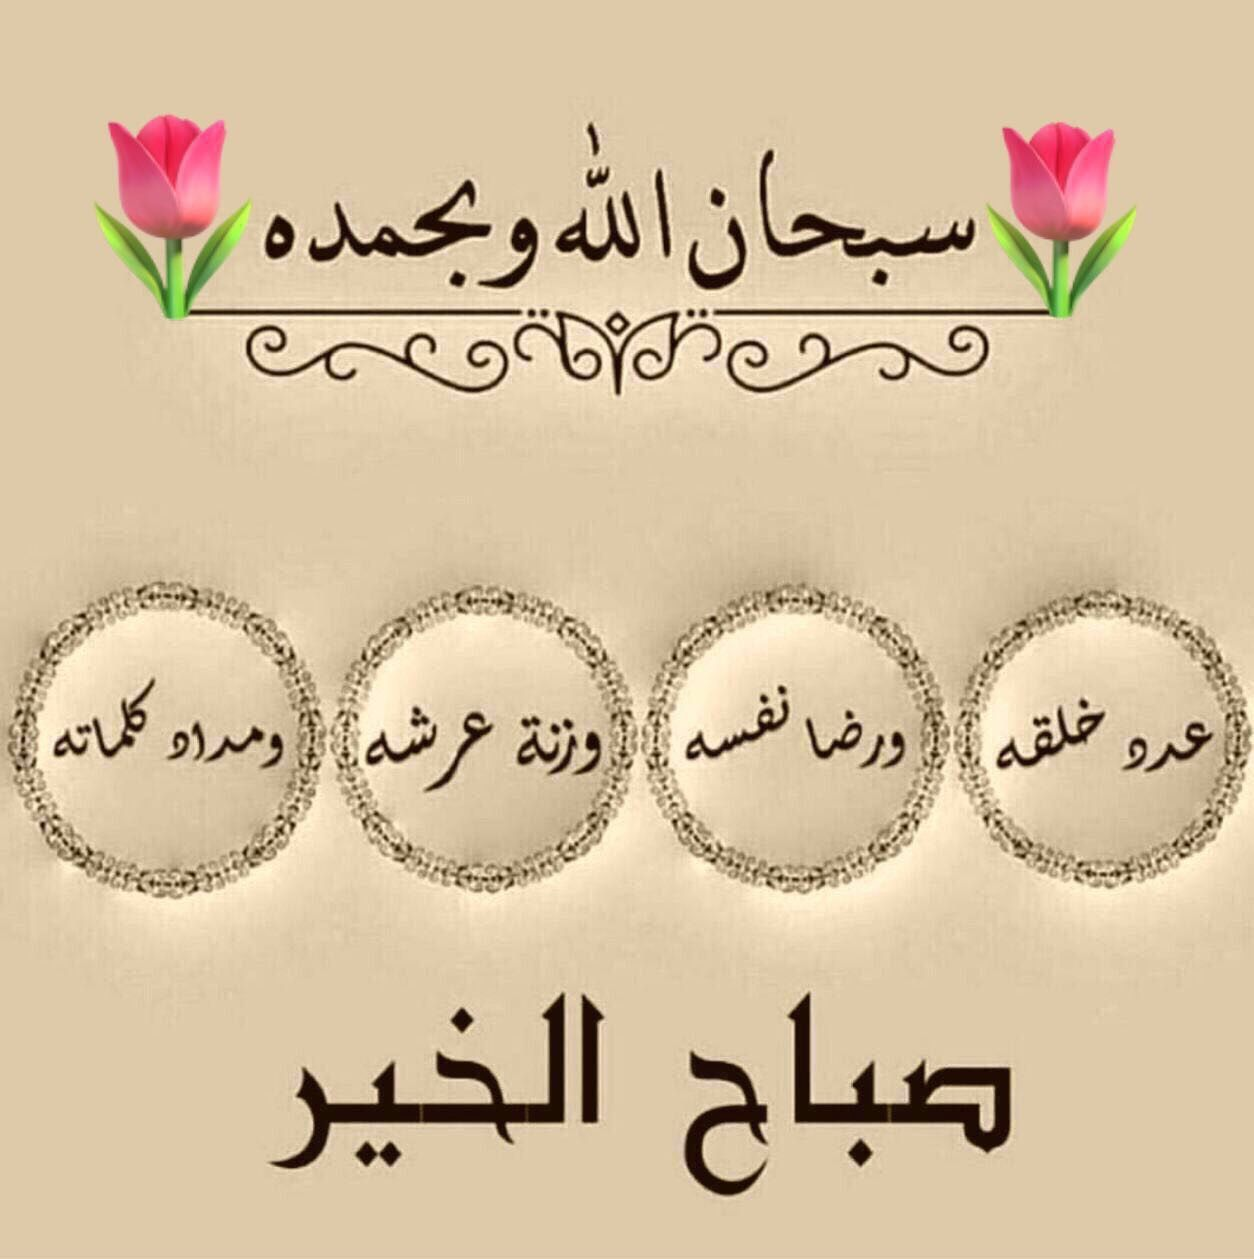 Pin By Raed Hawash On صباح الخير Morning Greetings Quotes Morning Greeting Morning Images